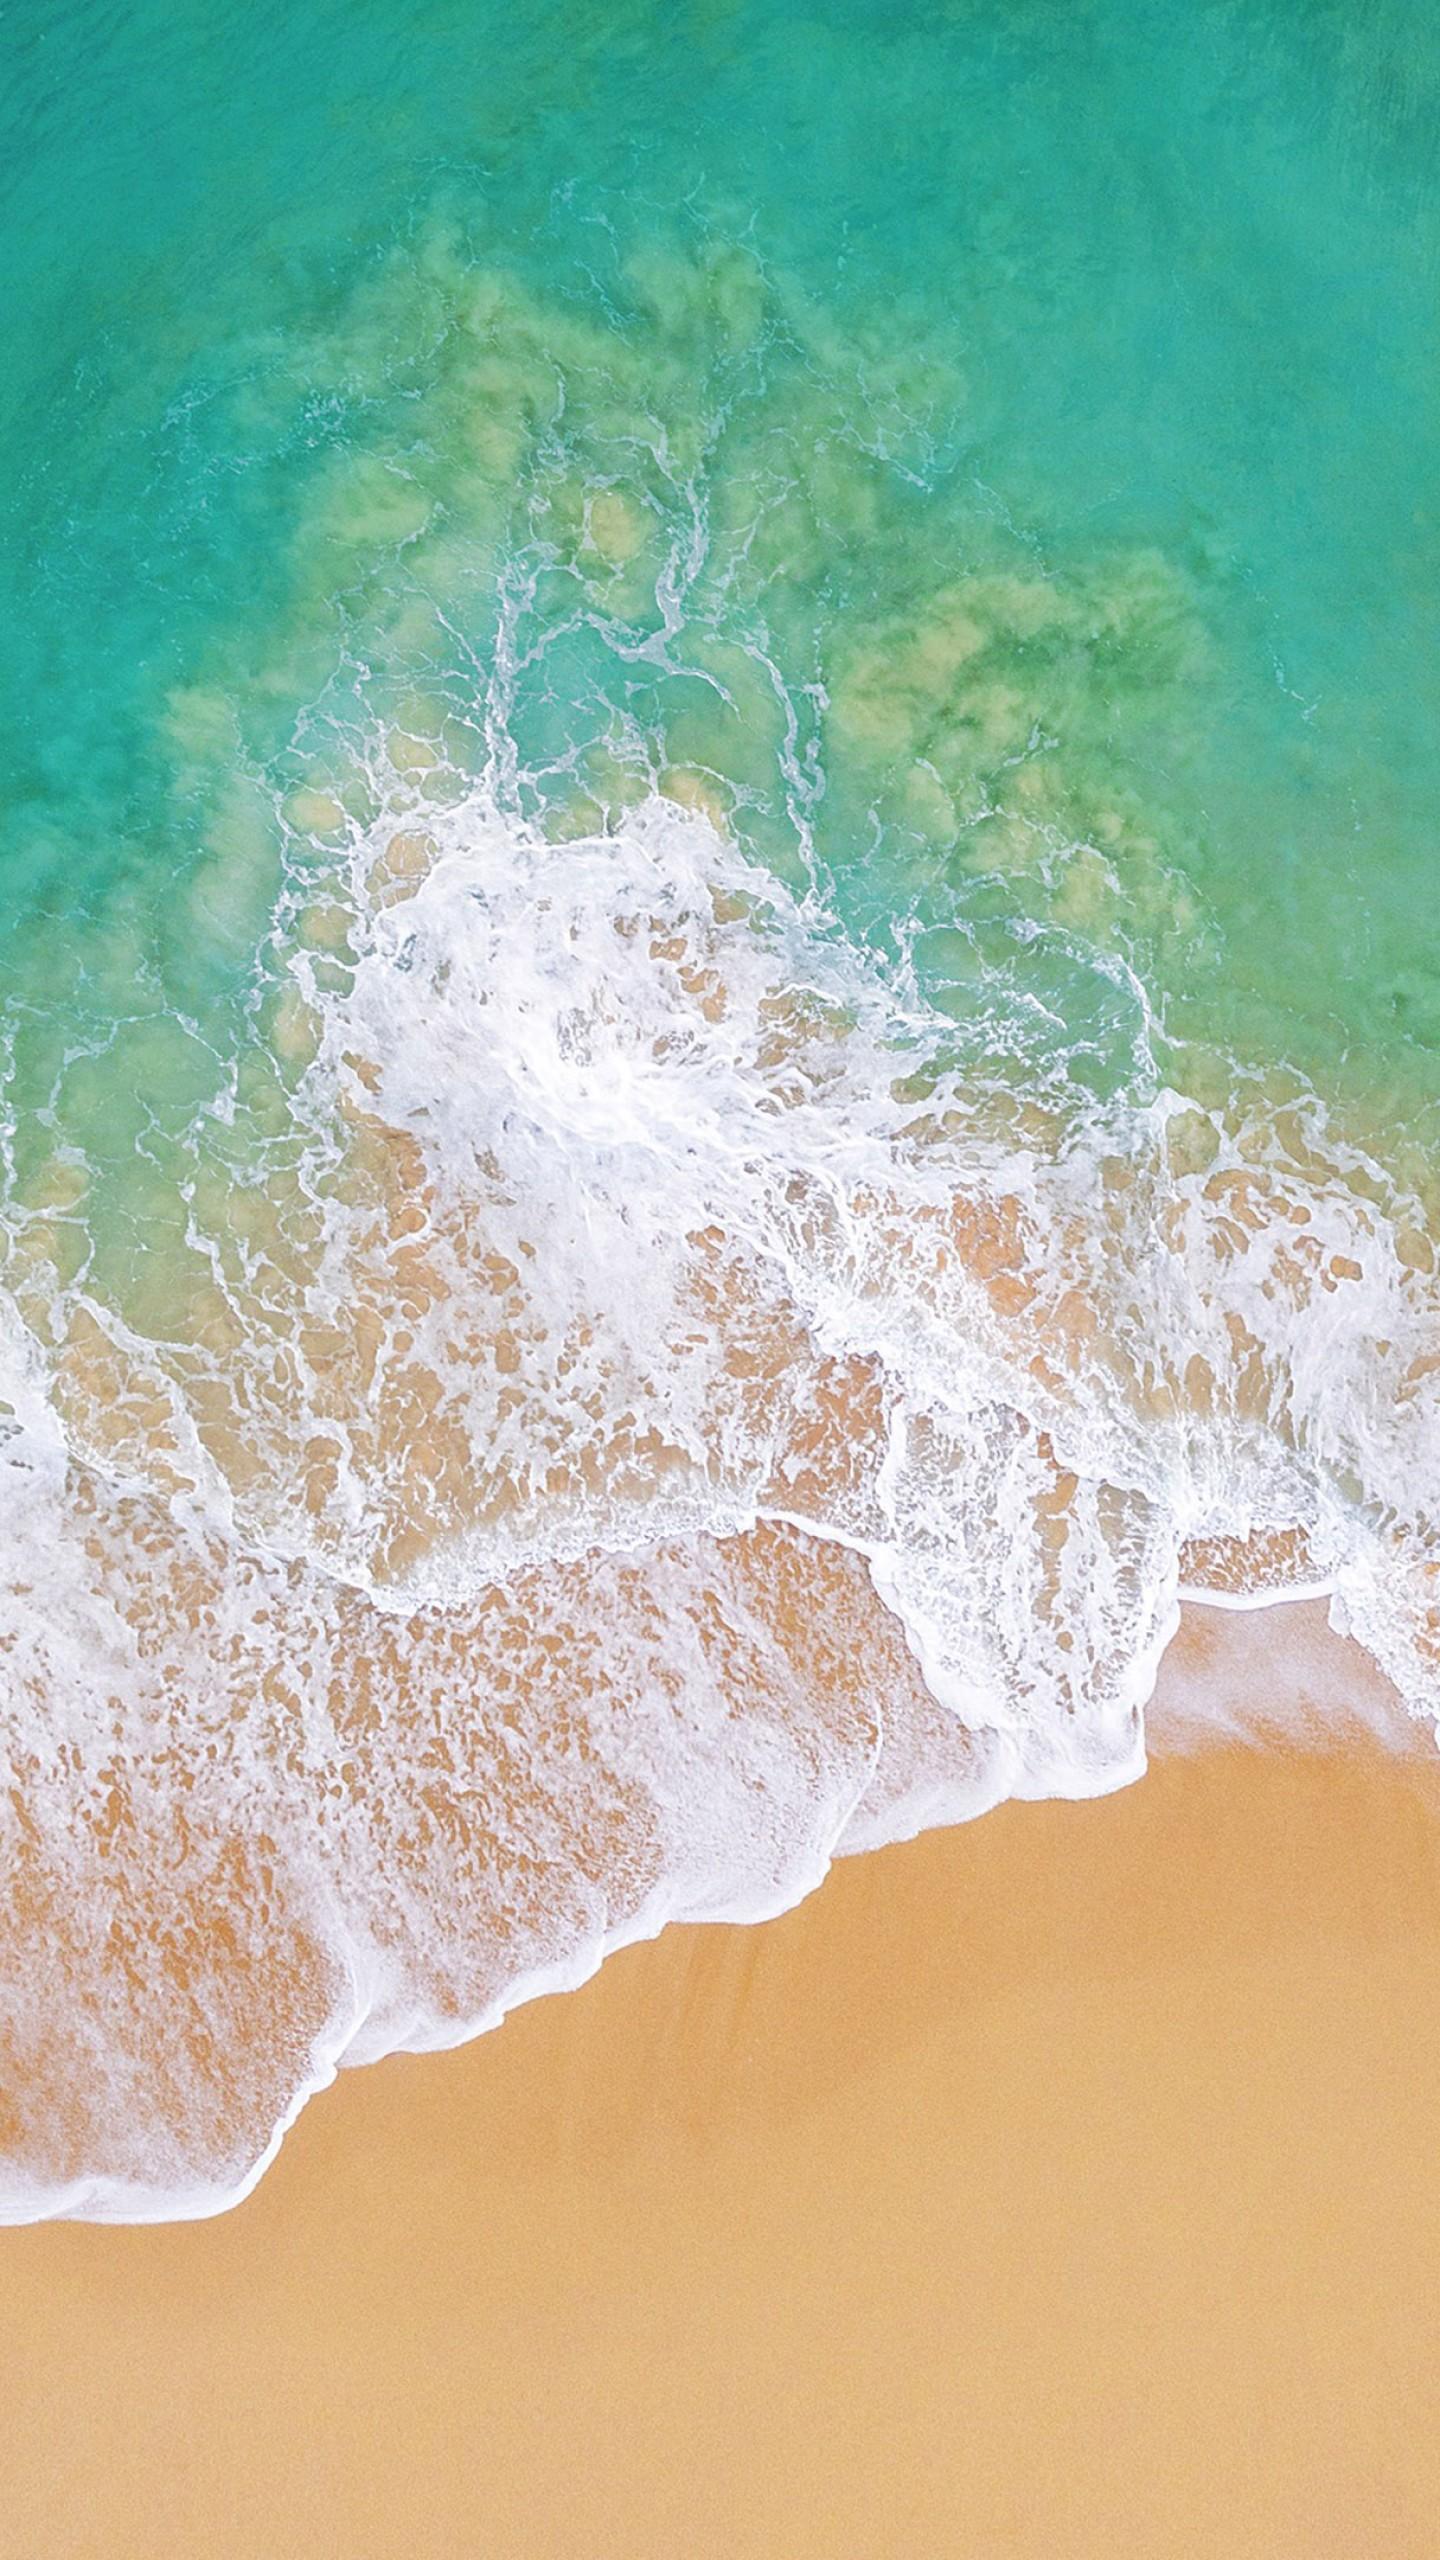 Wallpaper IOS 11, 4k, 5k, Beach, Ocean, OS #13655